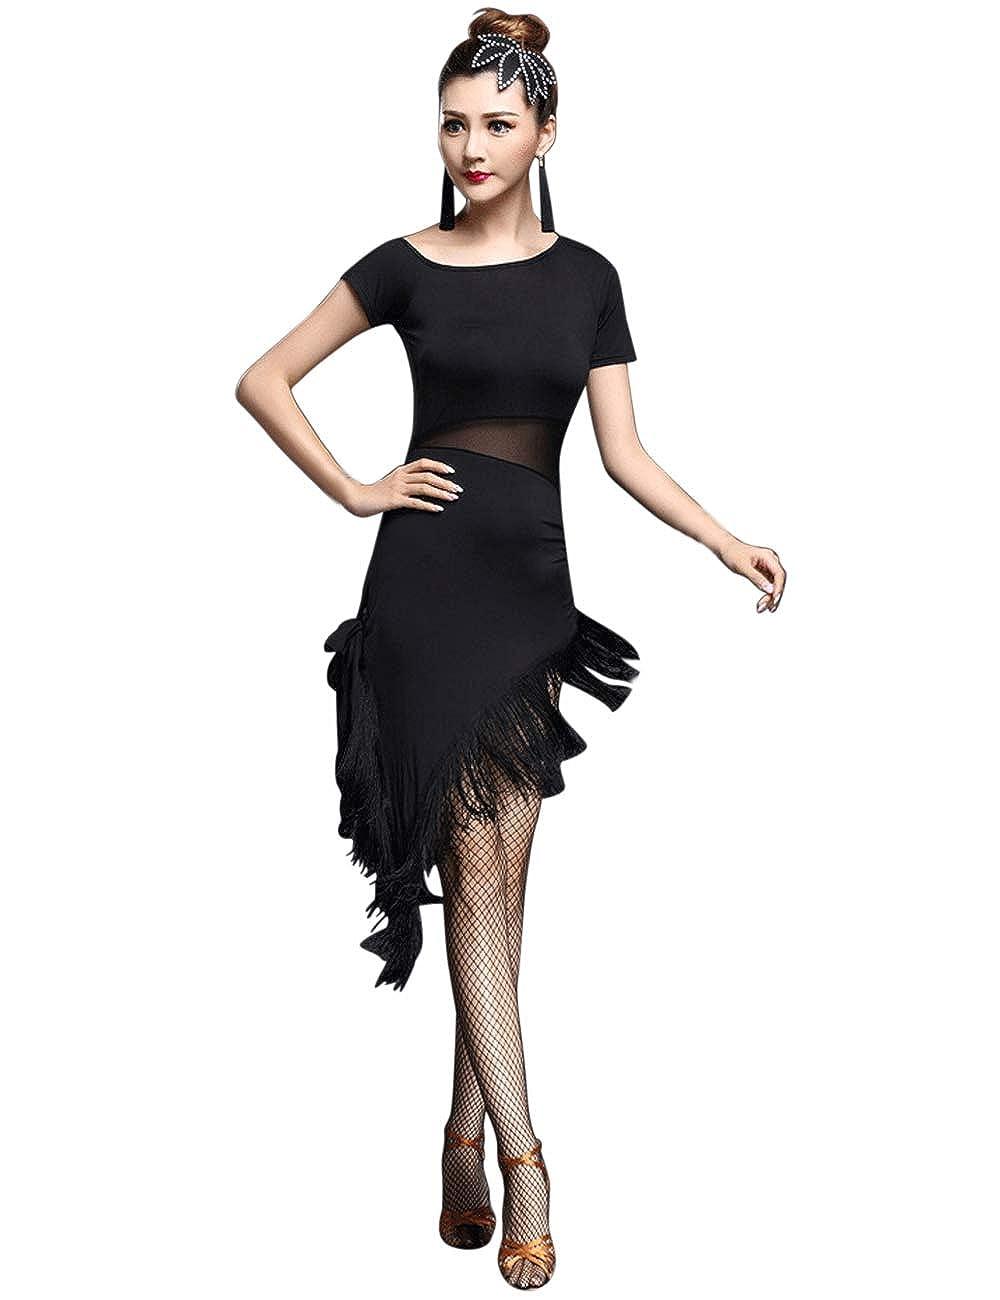 e3128c31 besbomig Sexy Tassel Latin Dance Dress Womens Party Performance Dancewear -  Ballroom Salsa Samba Tango Cocktail Dresses: Amazon.co.uk: Clothing